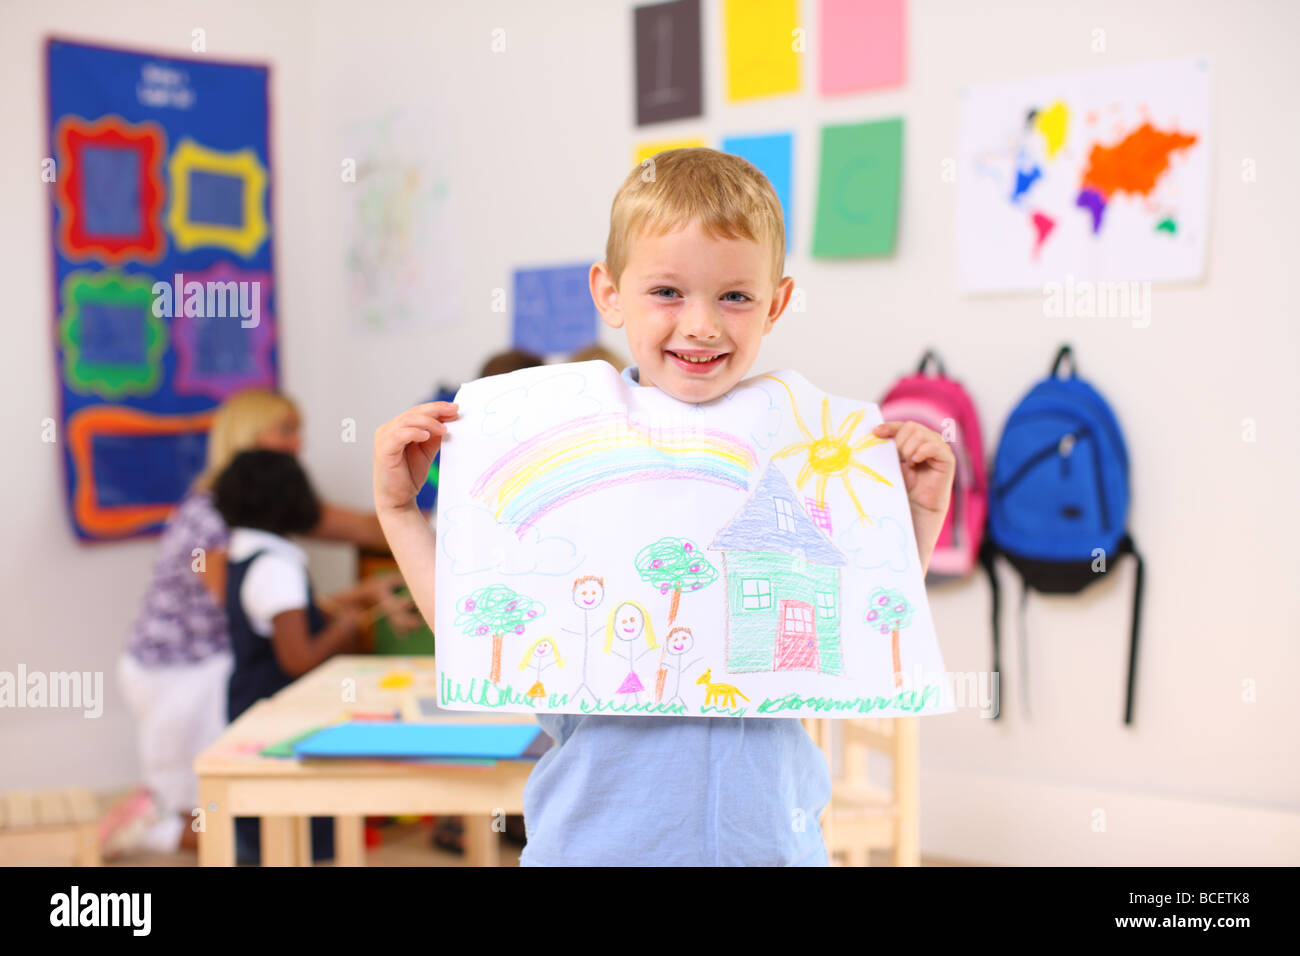 Preschool boy holding up artwork - Stock Image